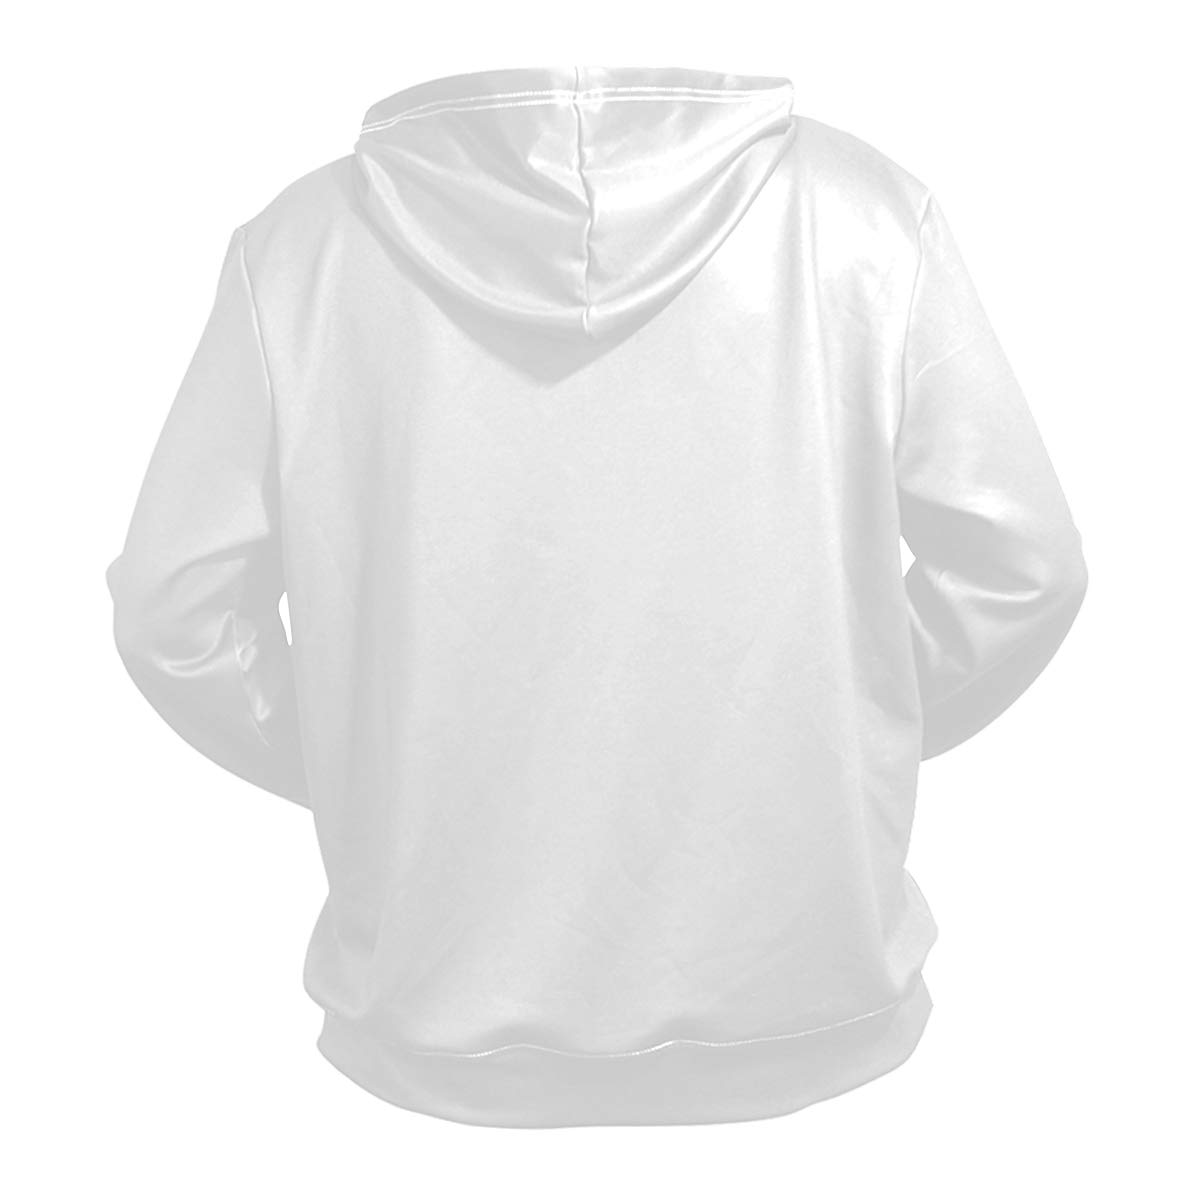 Arilce Rainbow Lips Pride LGBT Sweaters Fashion Hoodies Casual Sweatshirts Unisex